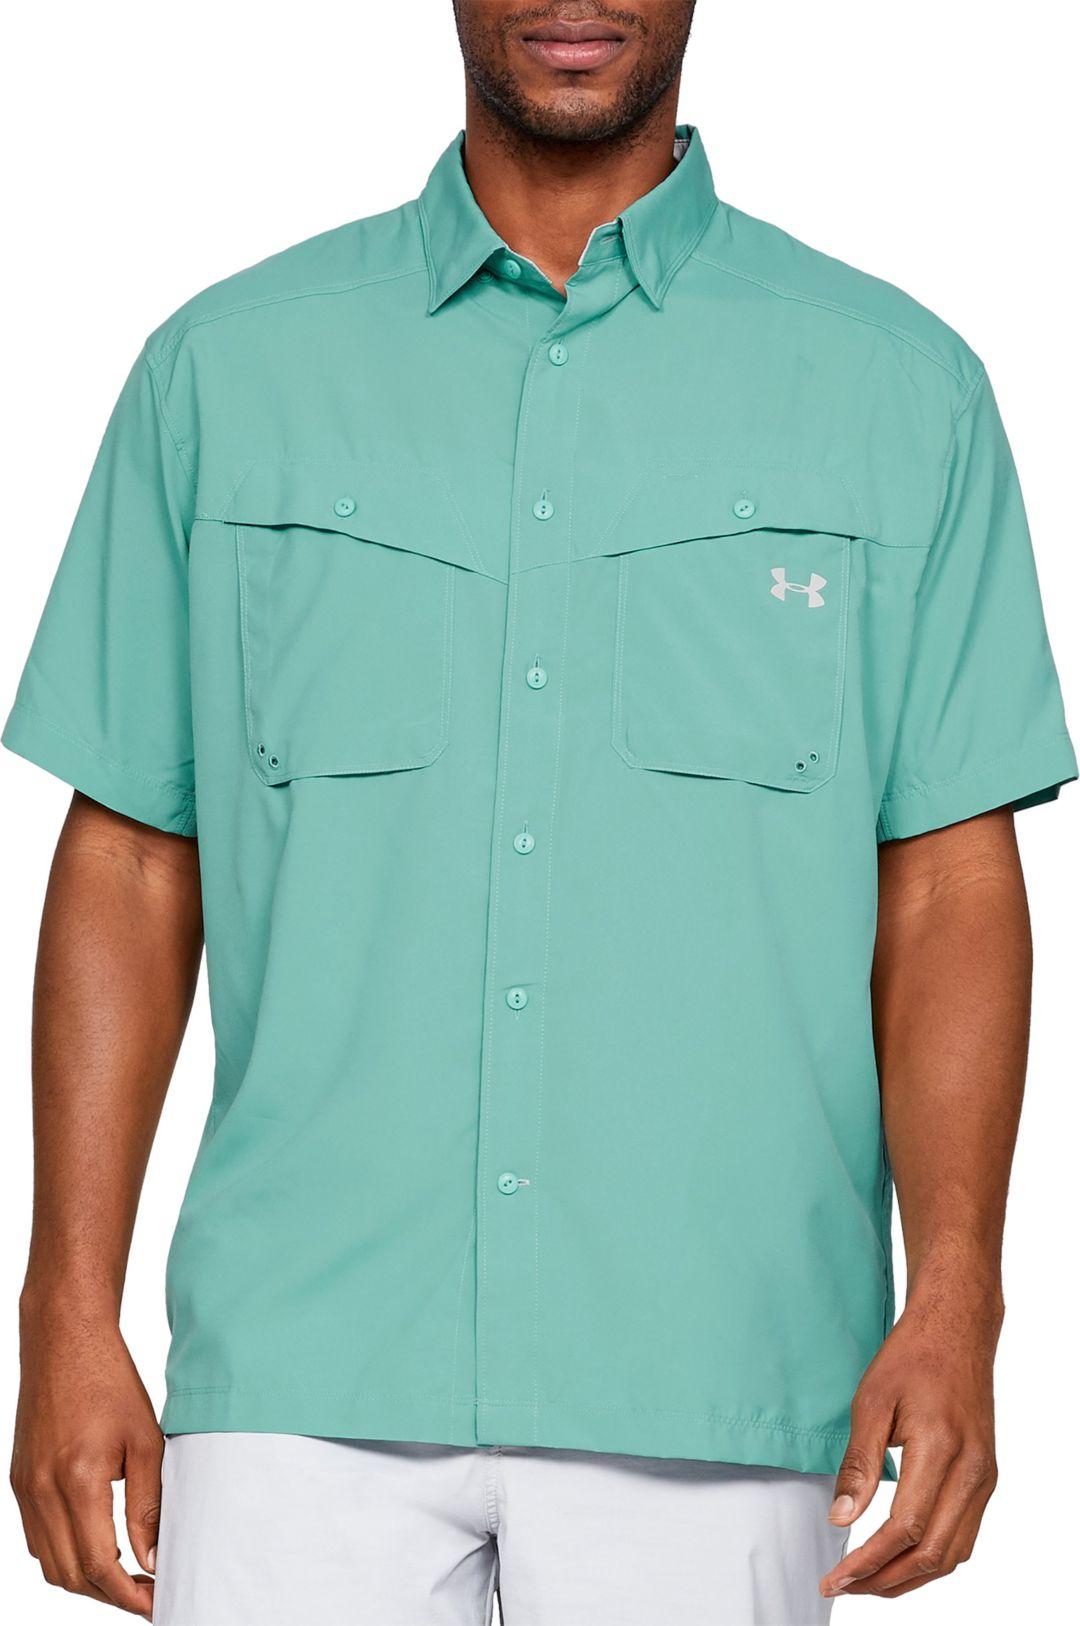 6e827545efce2 Under Armour Men's Tide Chaser Short Sleeve Shirt. noImageFound. Previous